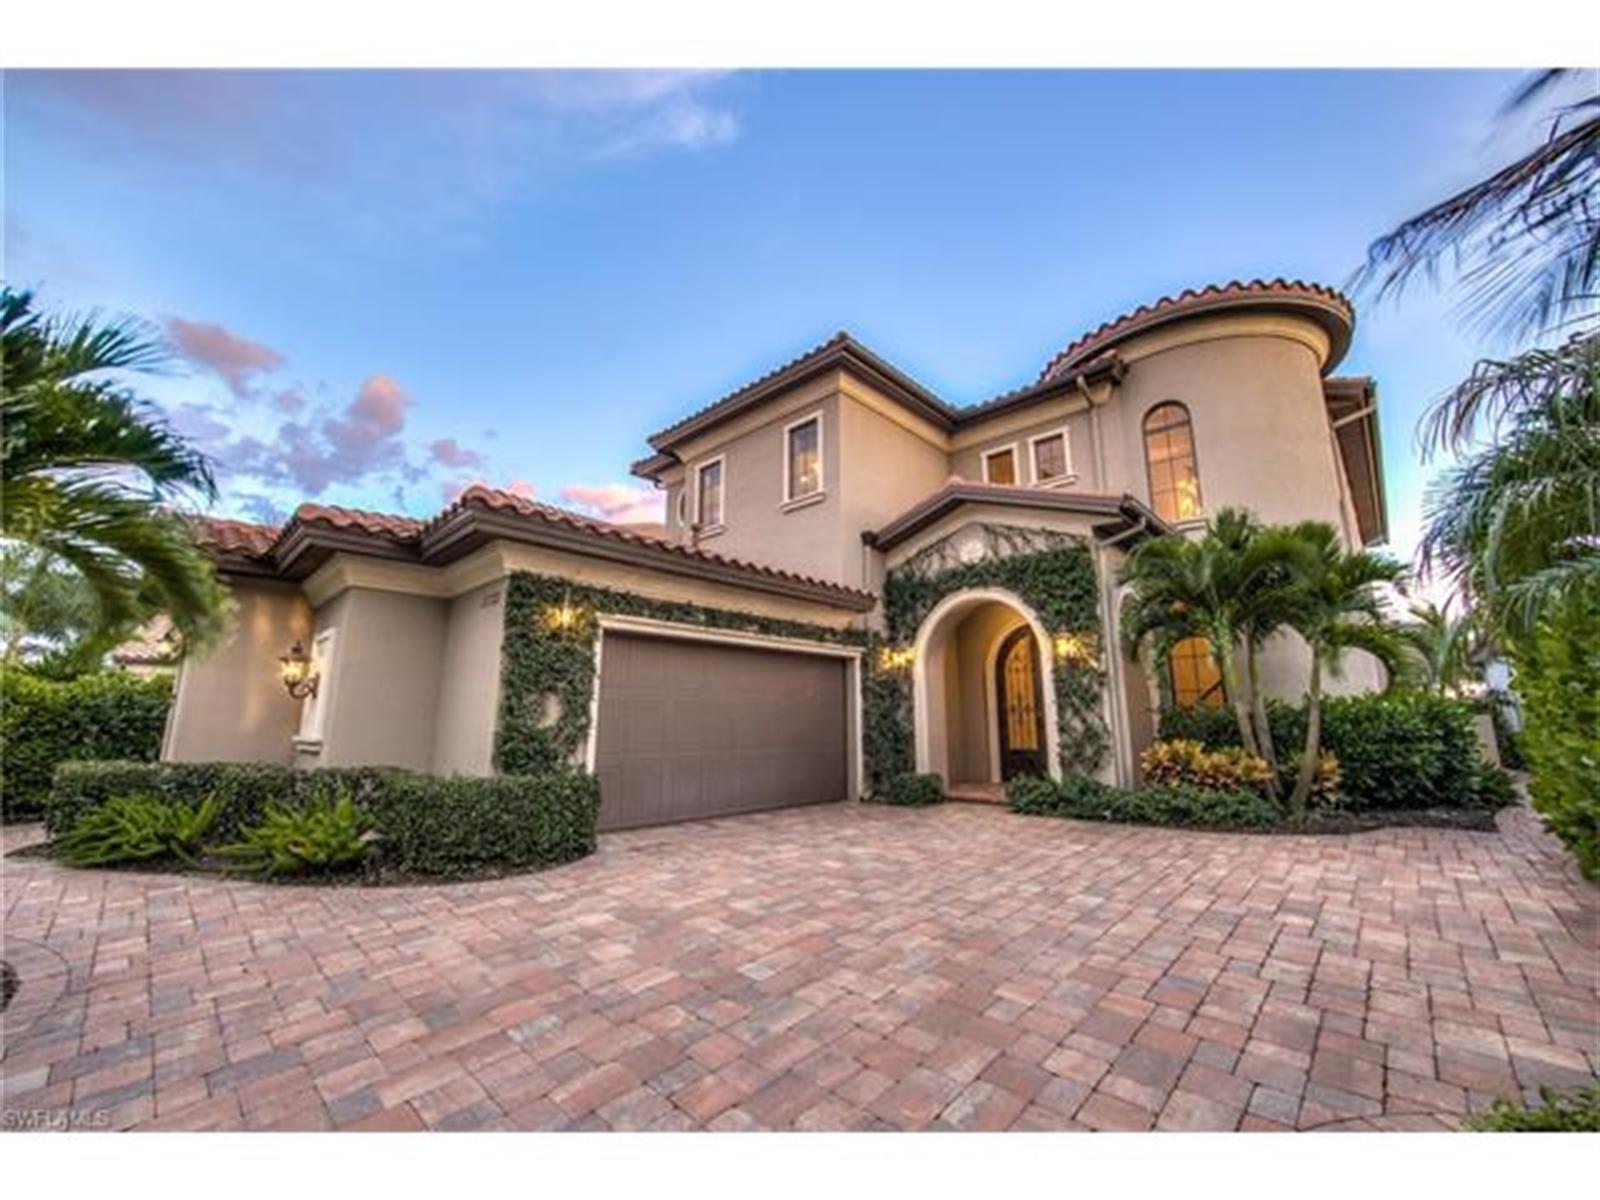 Real Estate Photography - 11735 Via Savona Ct, Miromar Lakes, FL, 33913 - Location 3